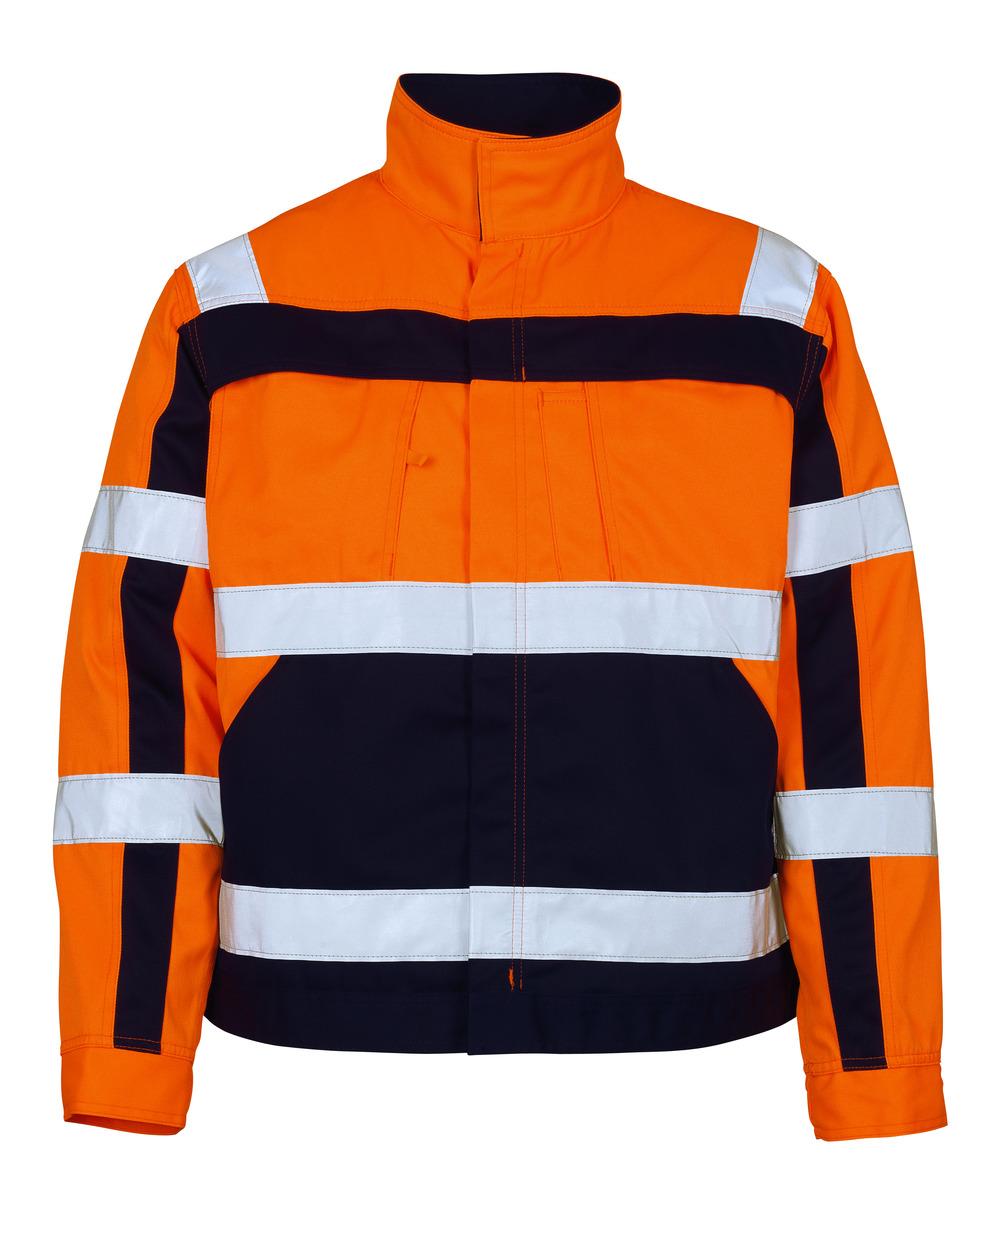 07109-860-141 Veste - Hi-vis orange/Marine